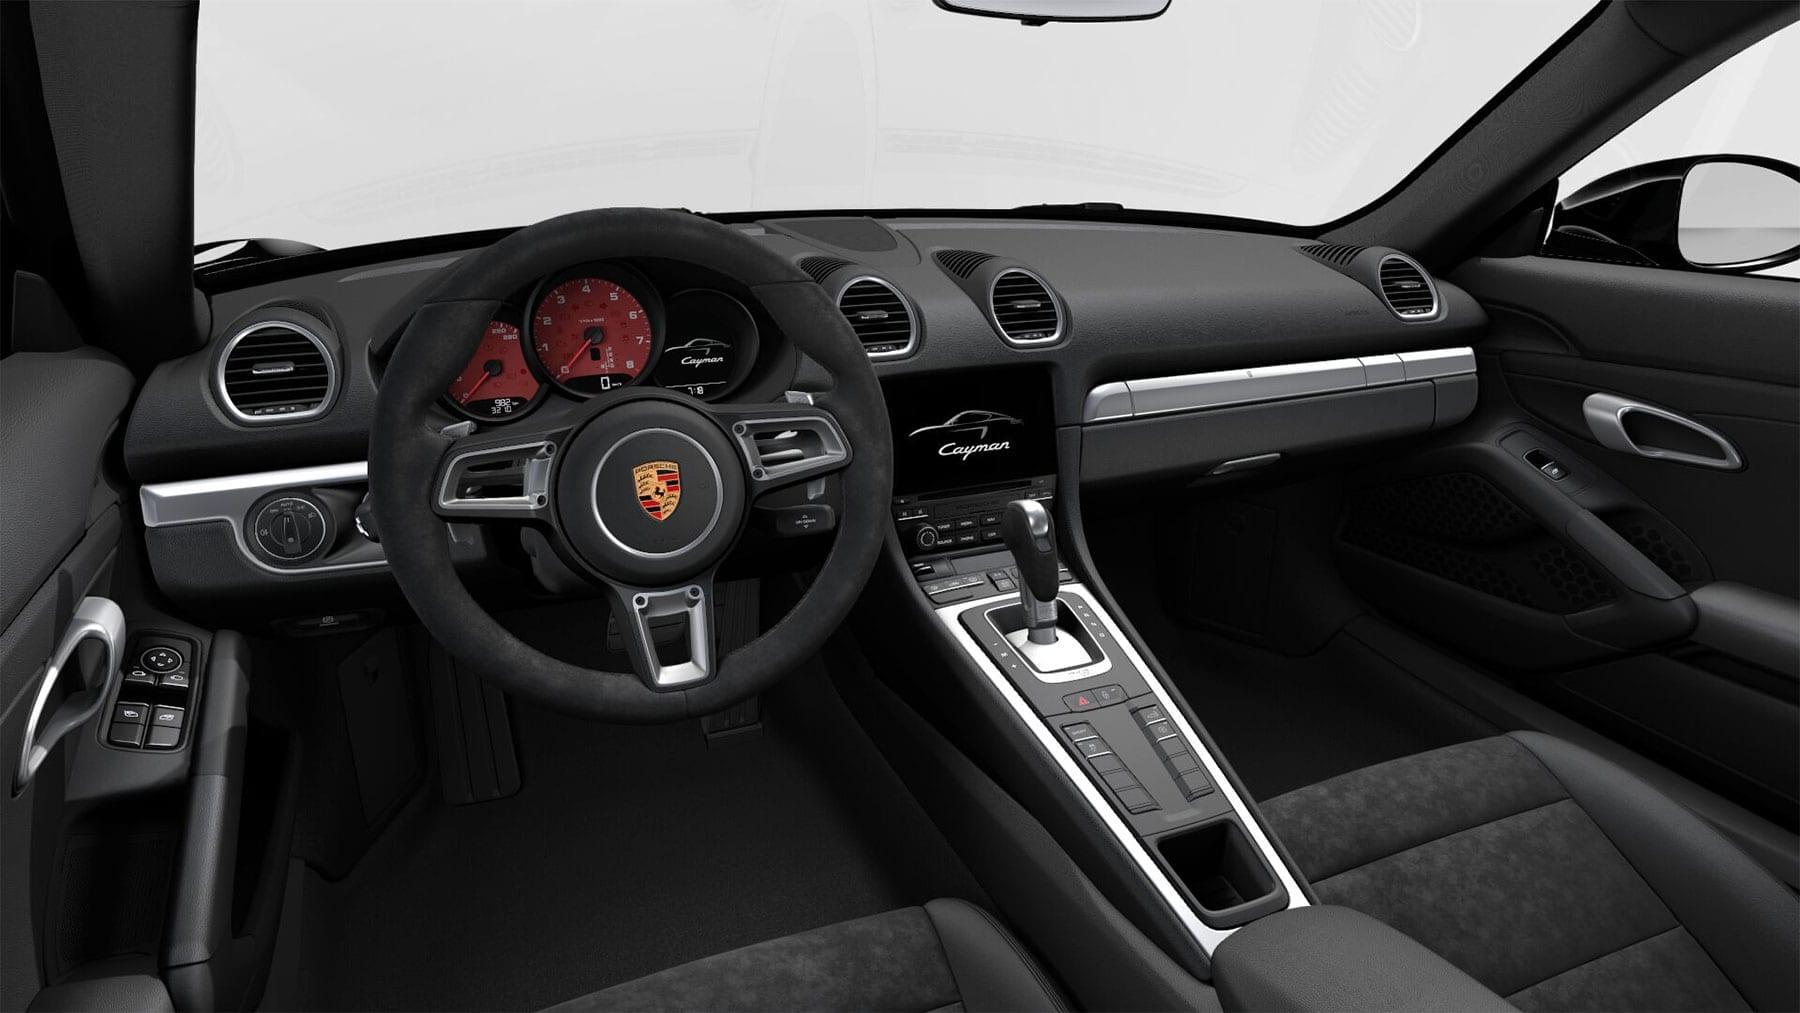 CarVia Porsche Cayman Interieur